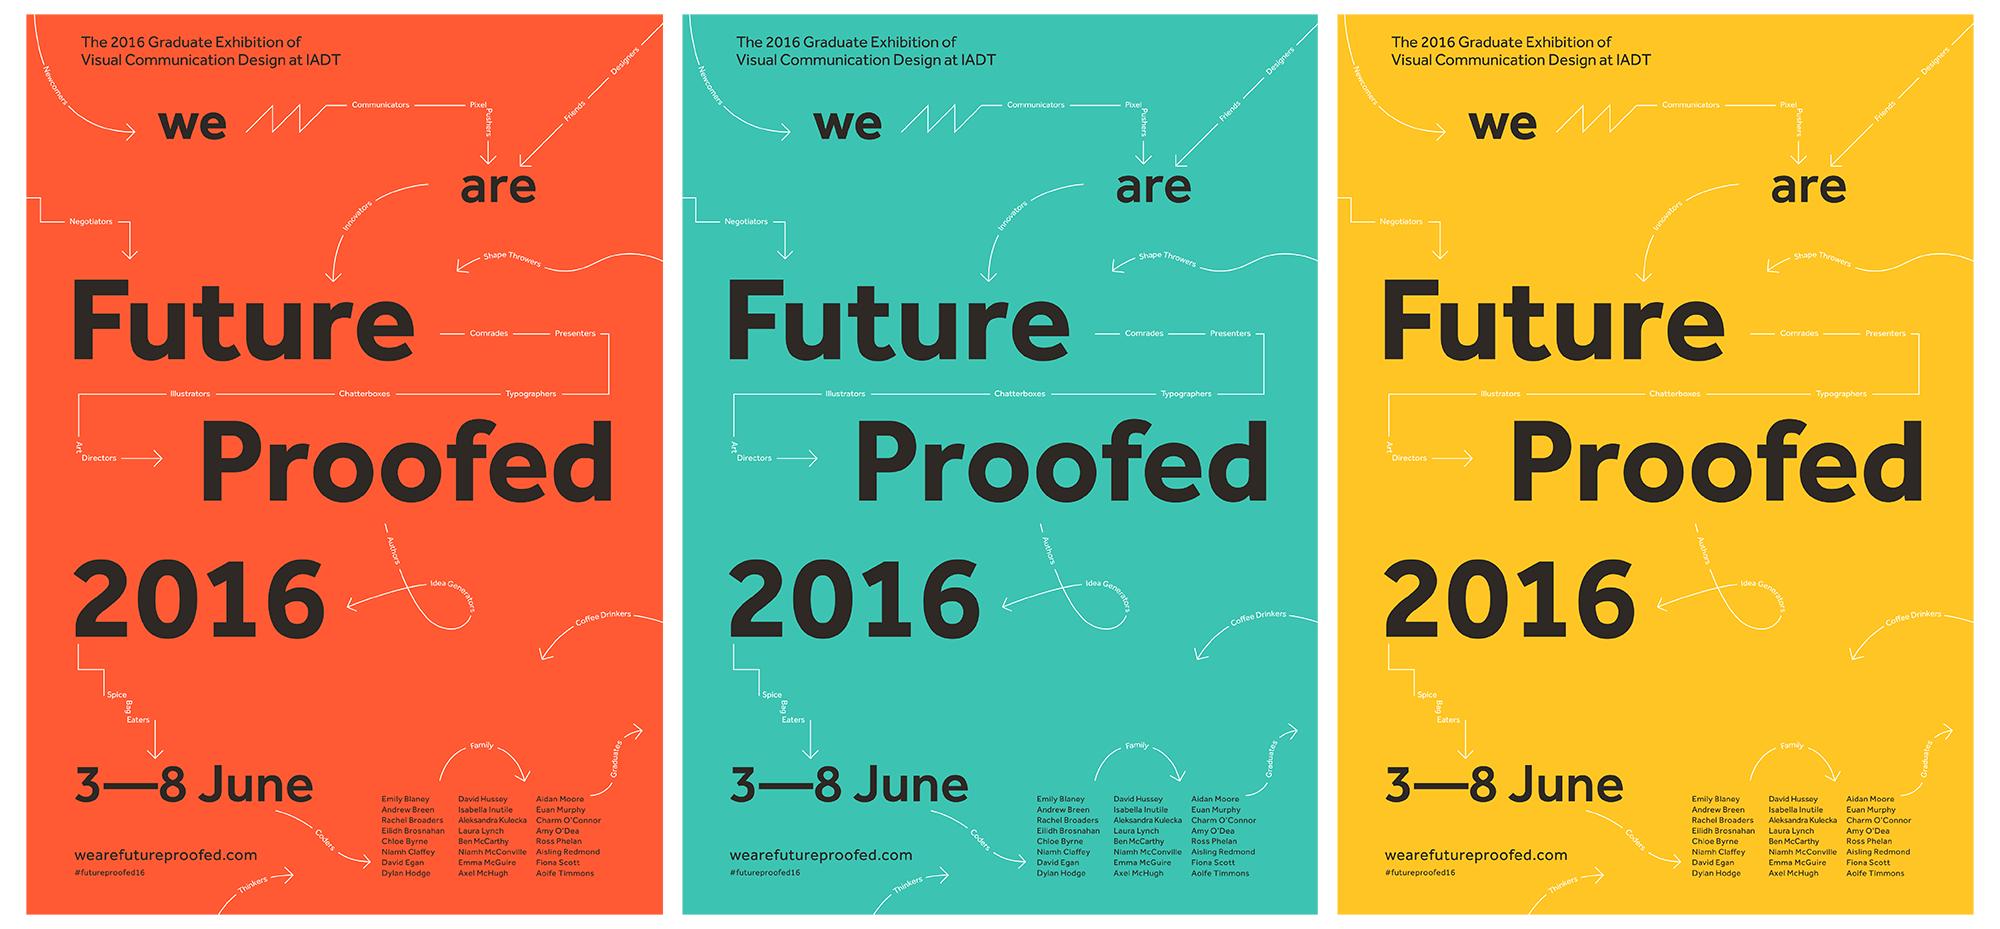 Cover image: Future Proofed 2016